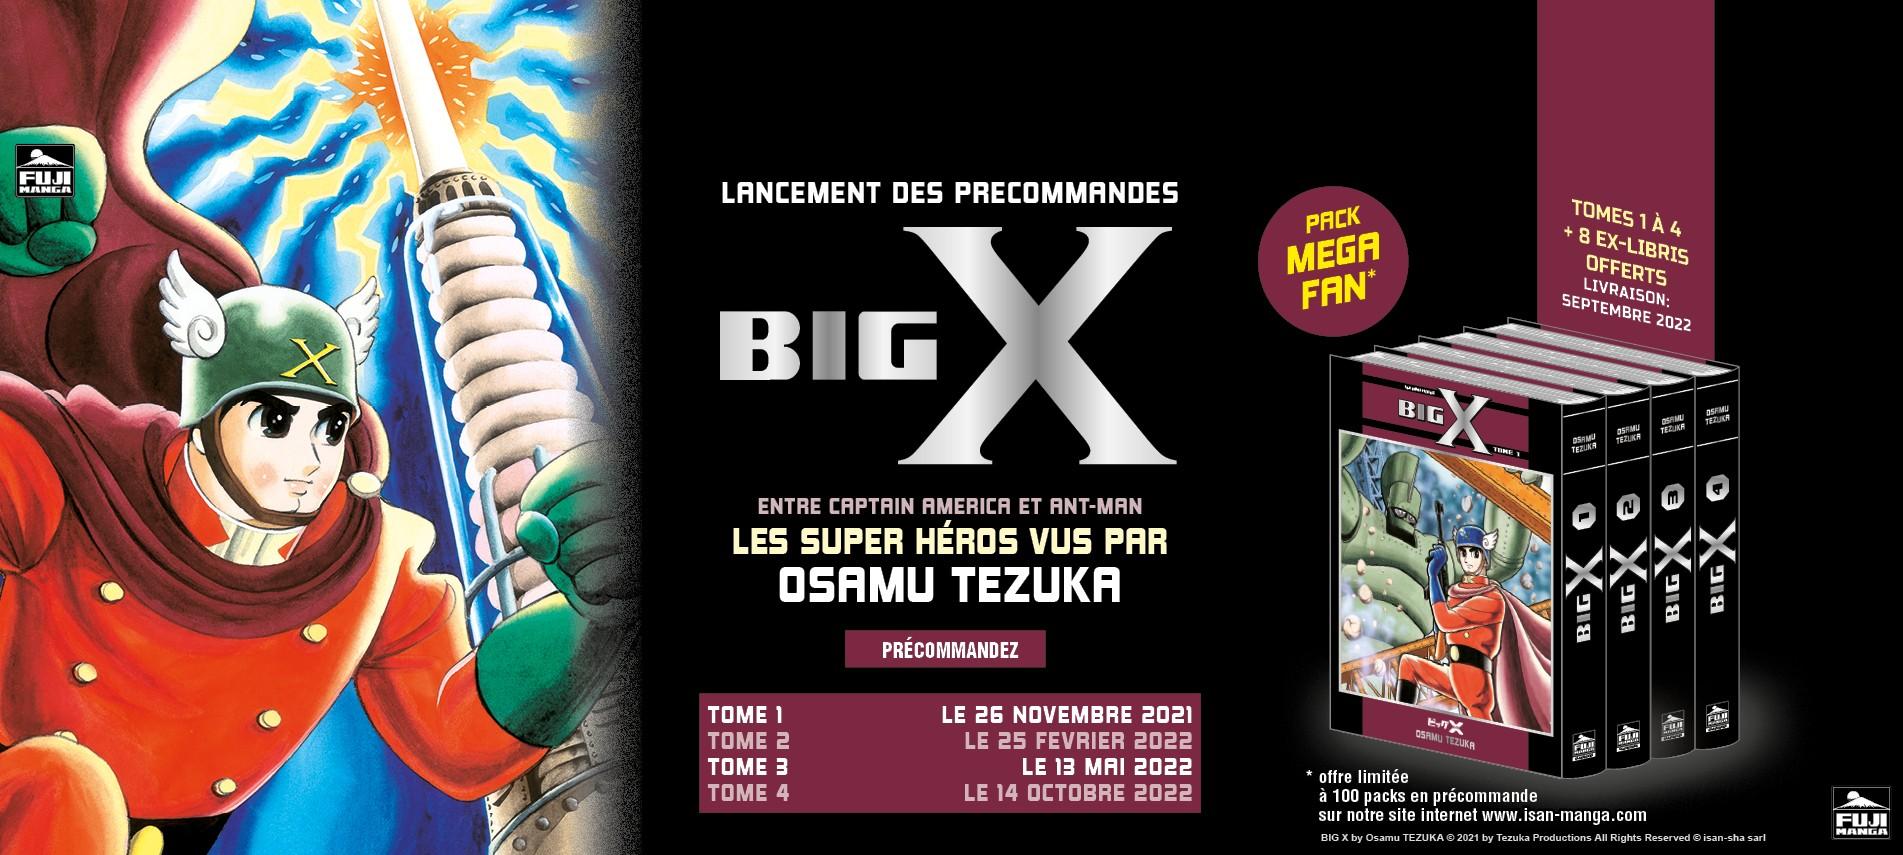 Big X entre Captain America et Ant-Man, les Super Héros vus par Osamu Tezuka